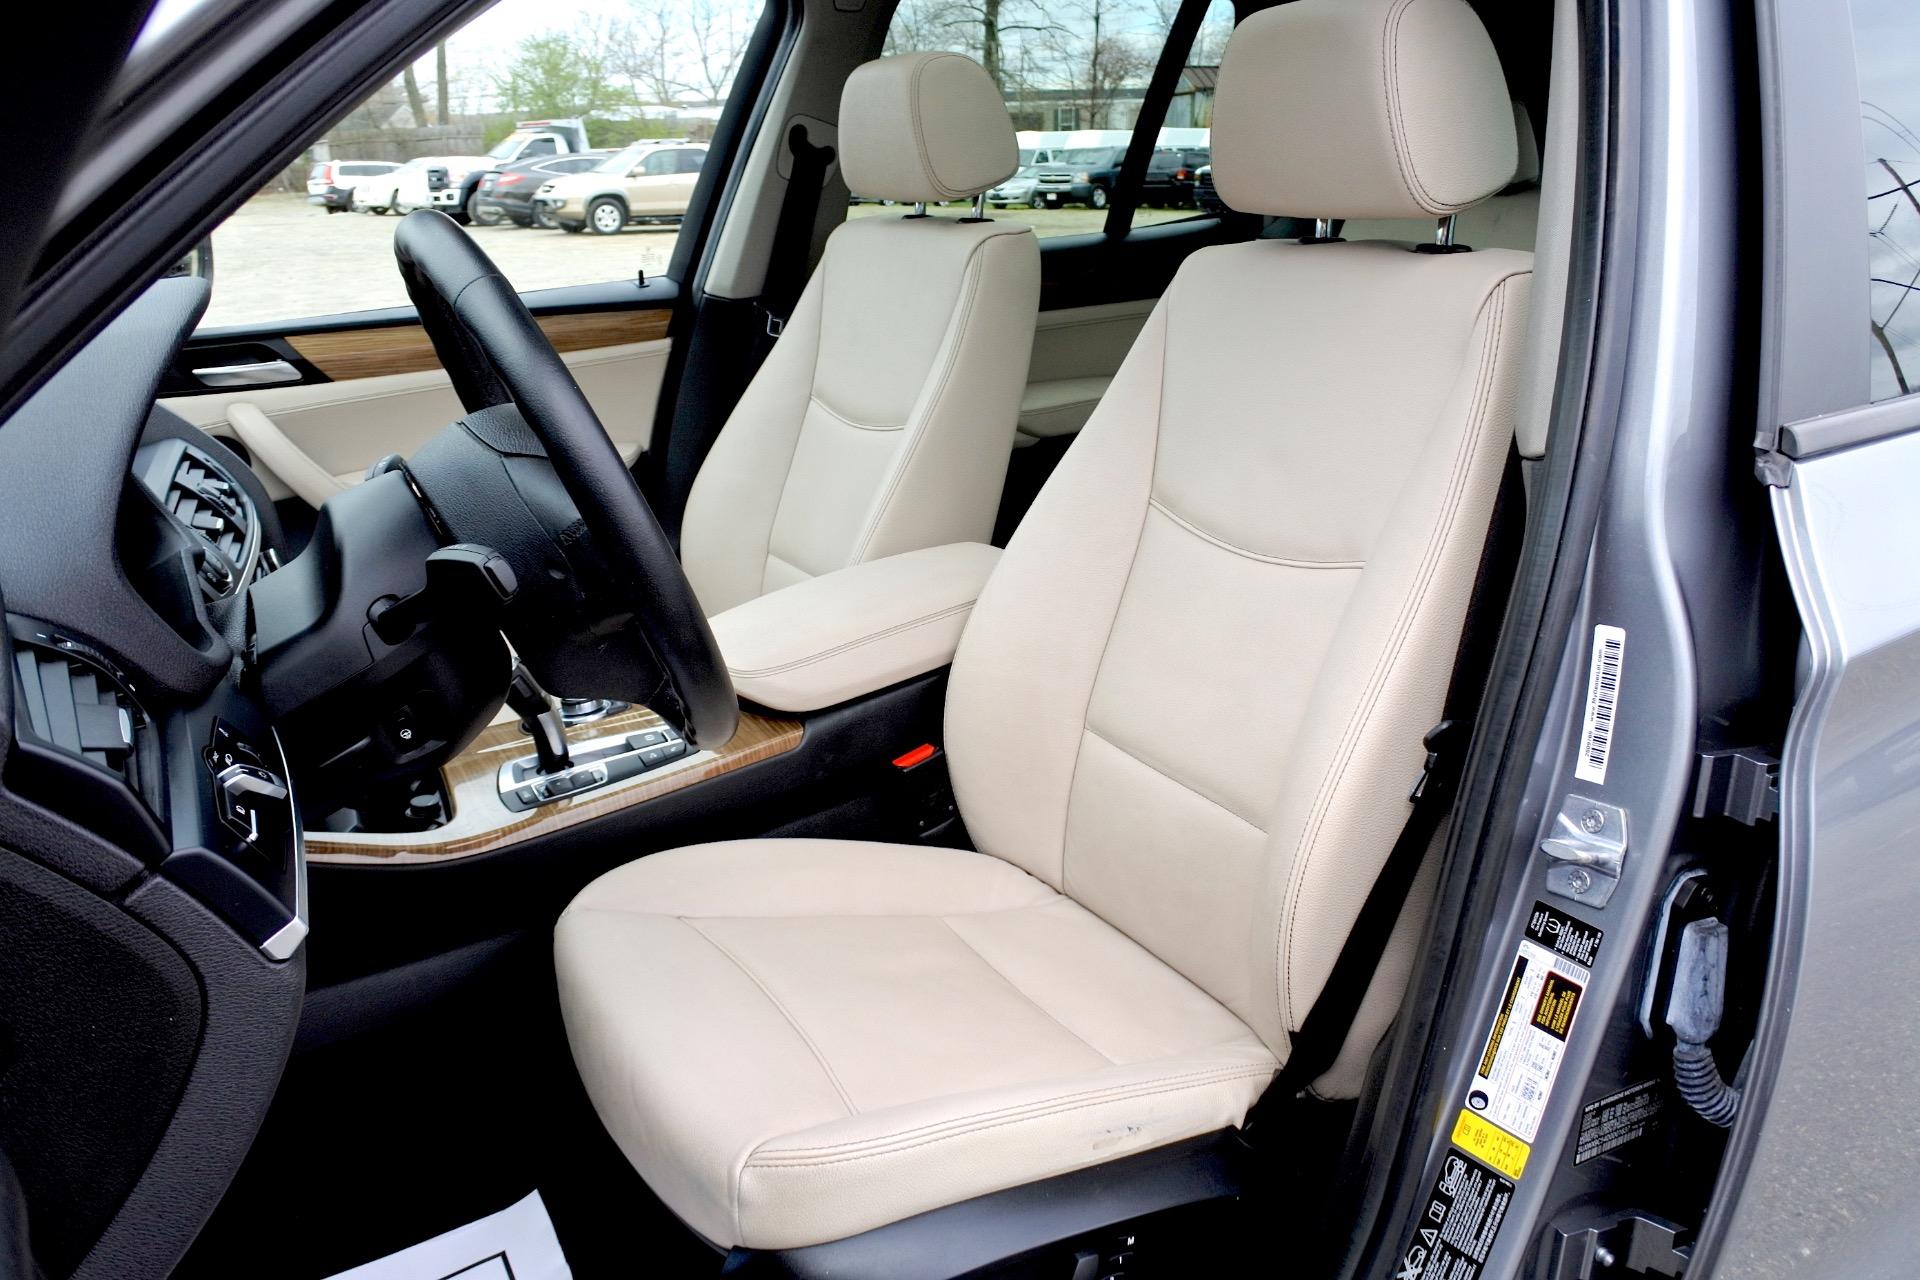 Used 2013 BMW X3 xDrive28i AWD Used 2013 BMW X3 xDrive28i AWD for sale  at Metro West Motorcars LLC in Shrewsbury MA 14